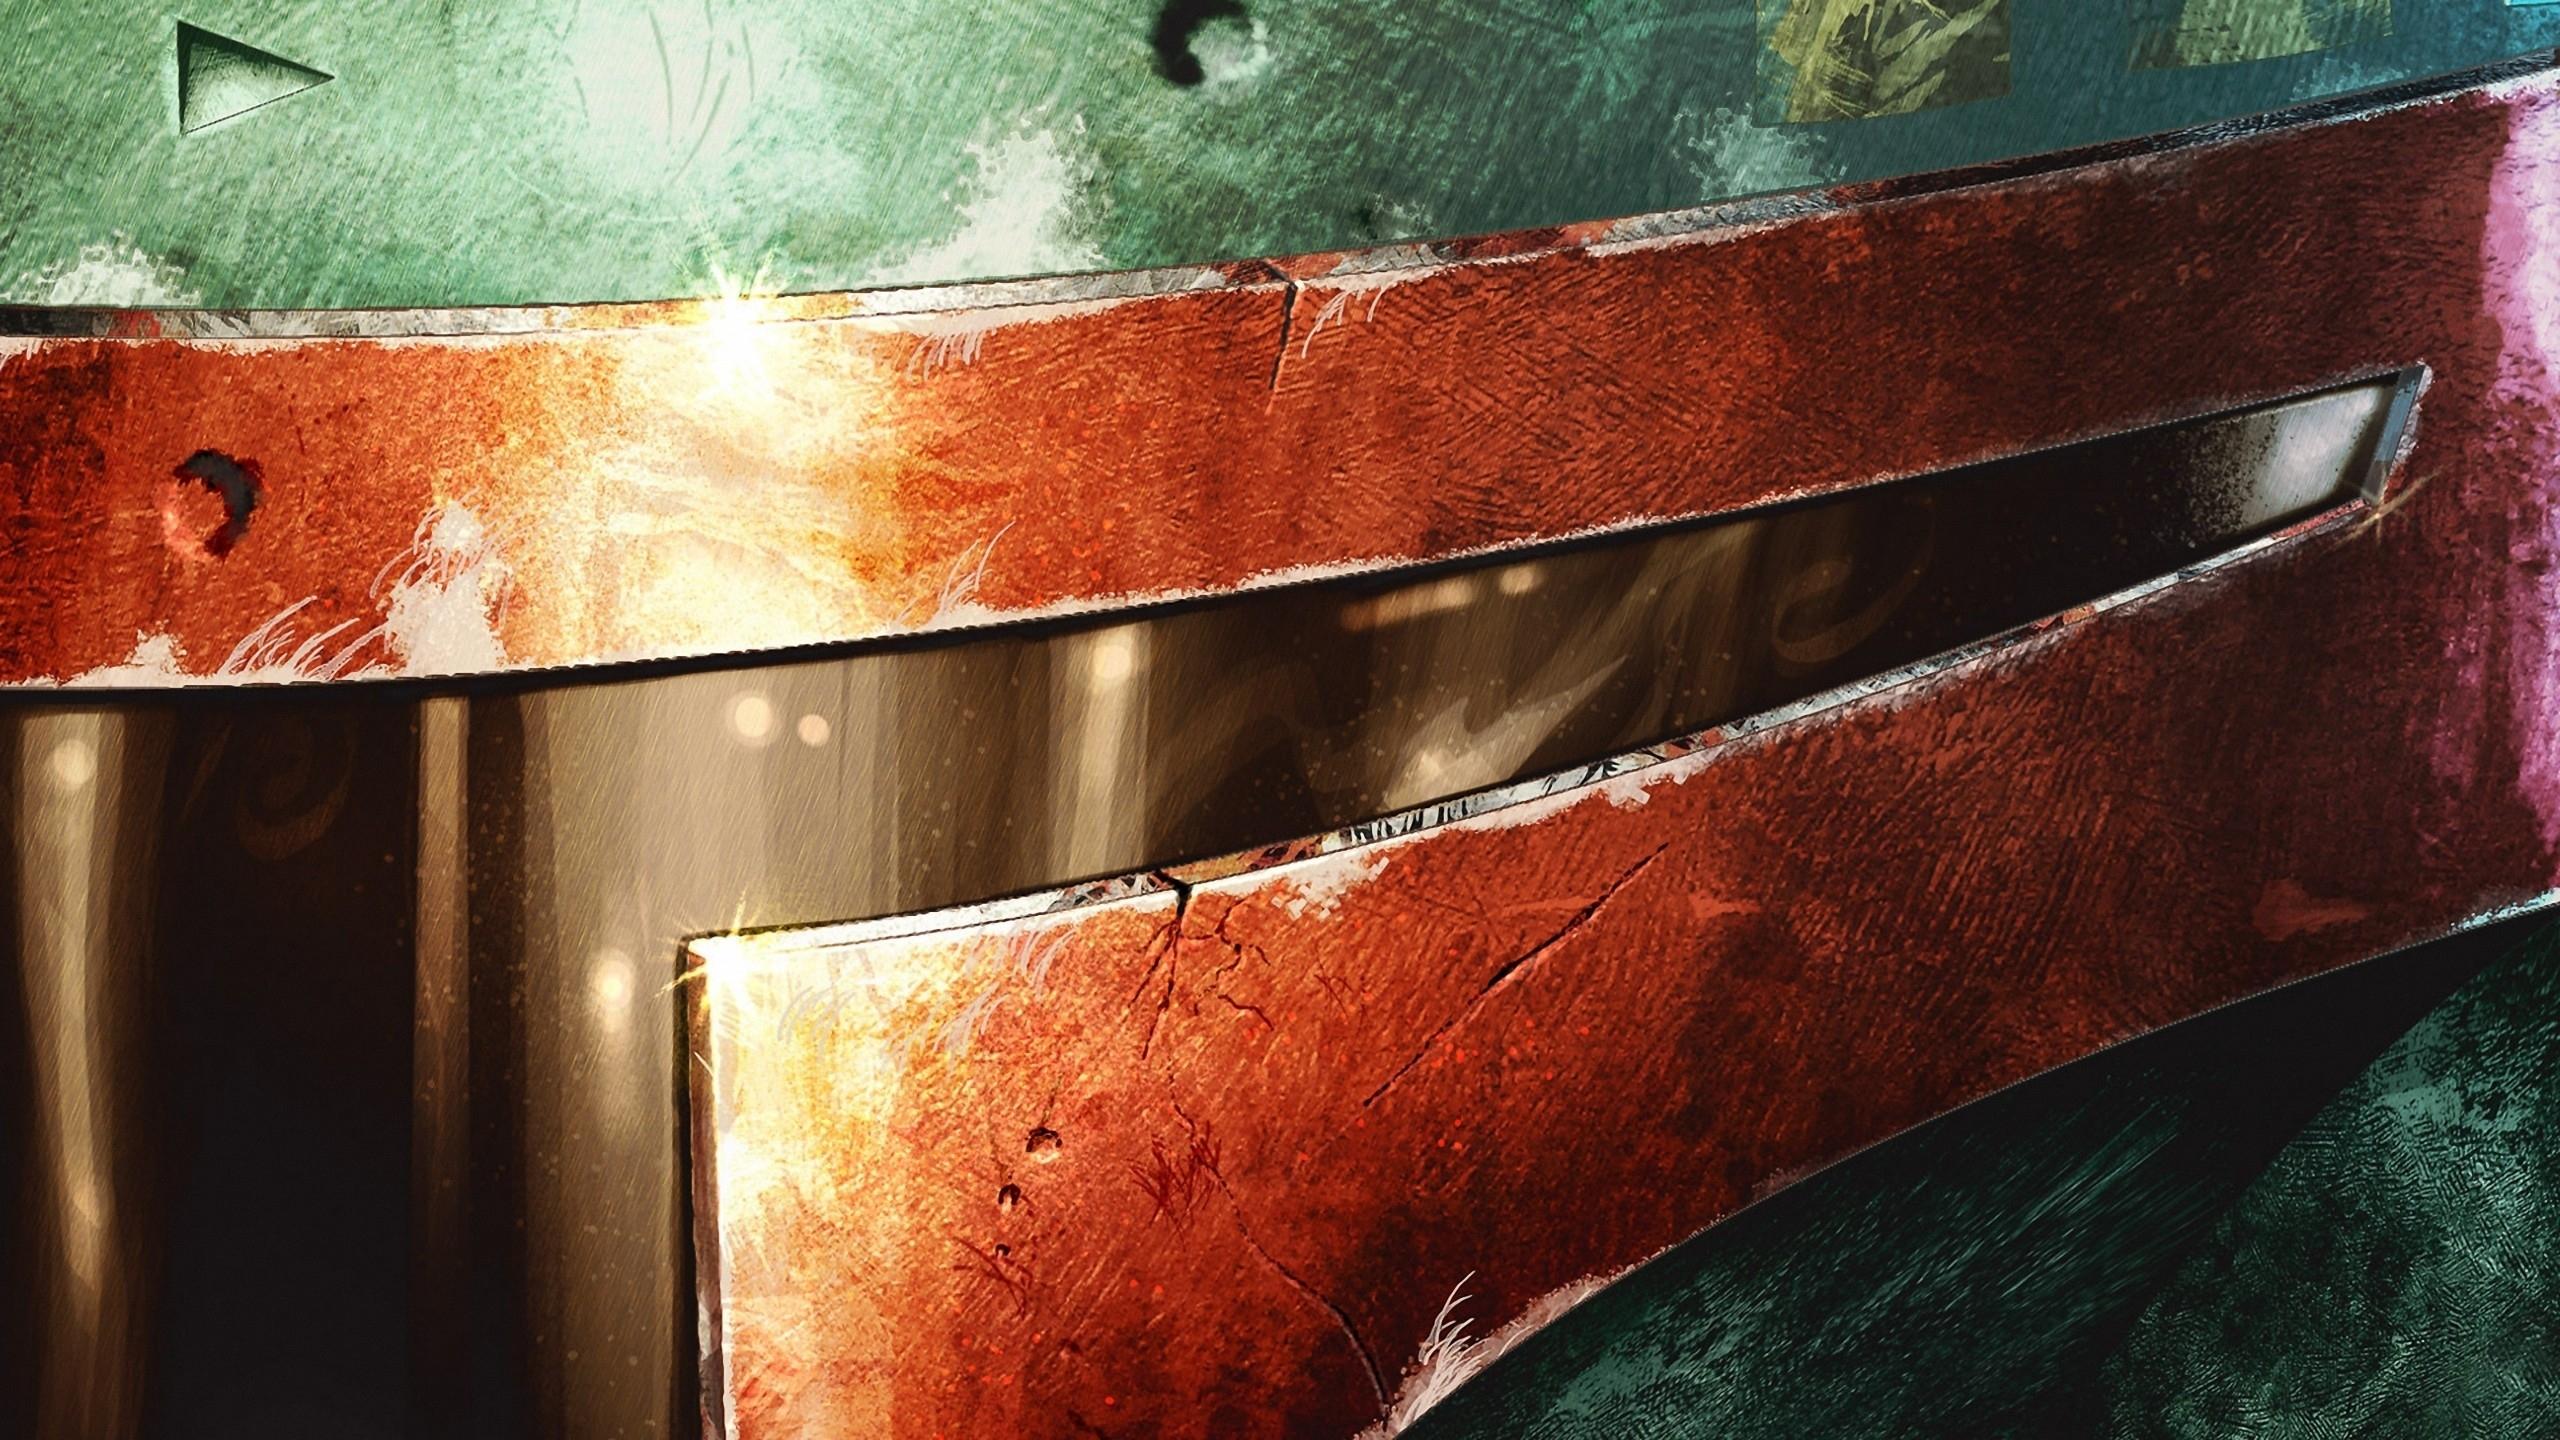 76 Boba Fett HD Wallpapers | Backgrounds - Wallpaper Abyss